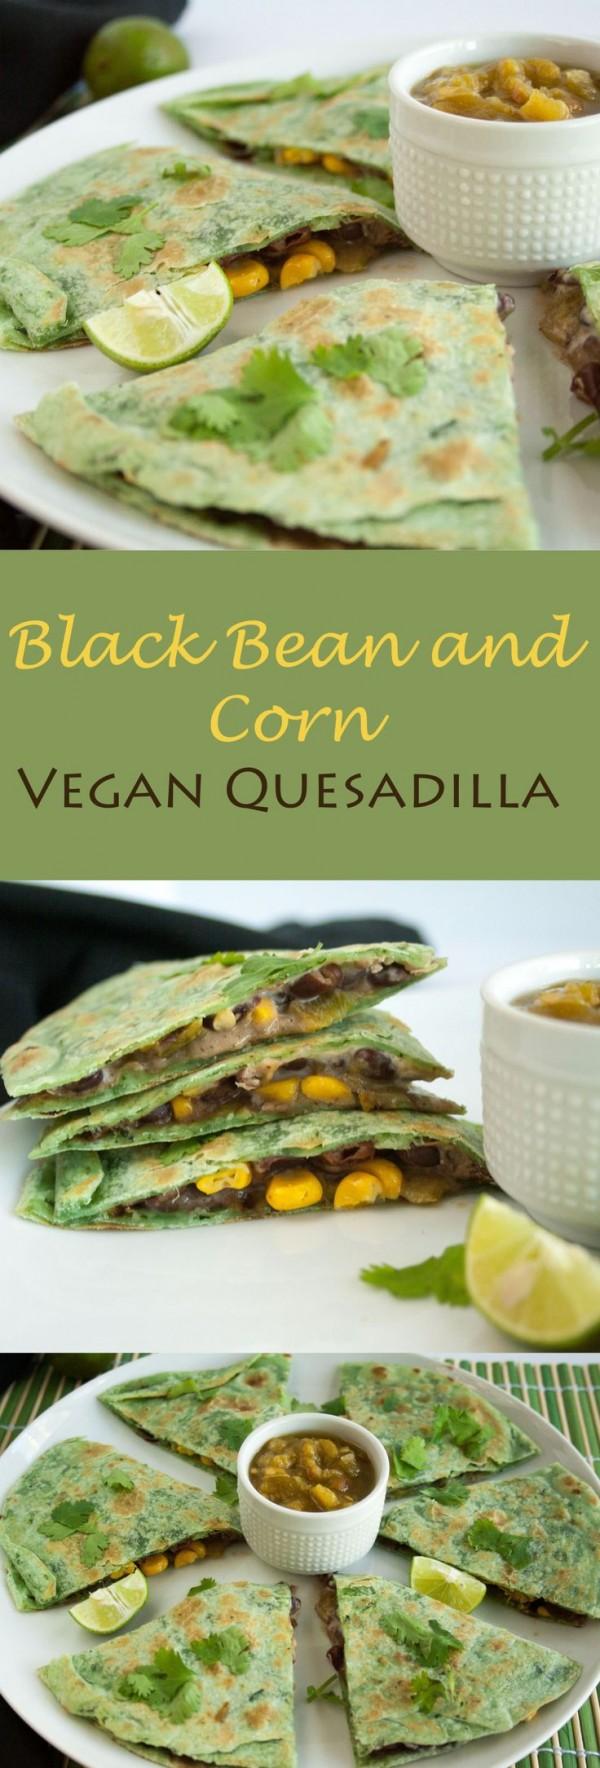 Get the recipe Black Bean and Corn Vegan Quesadilla @recipes_to_go